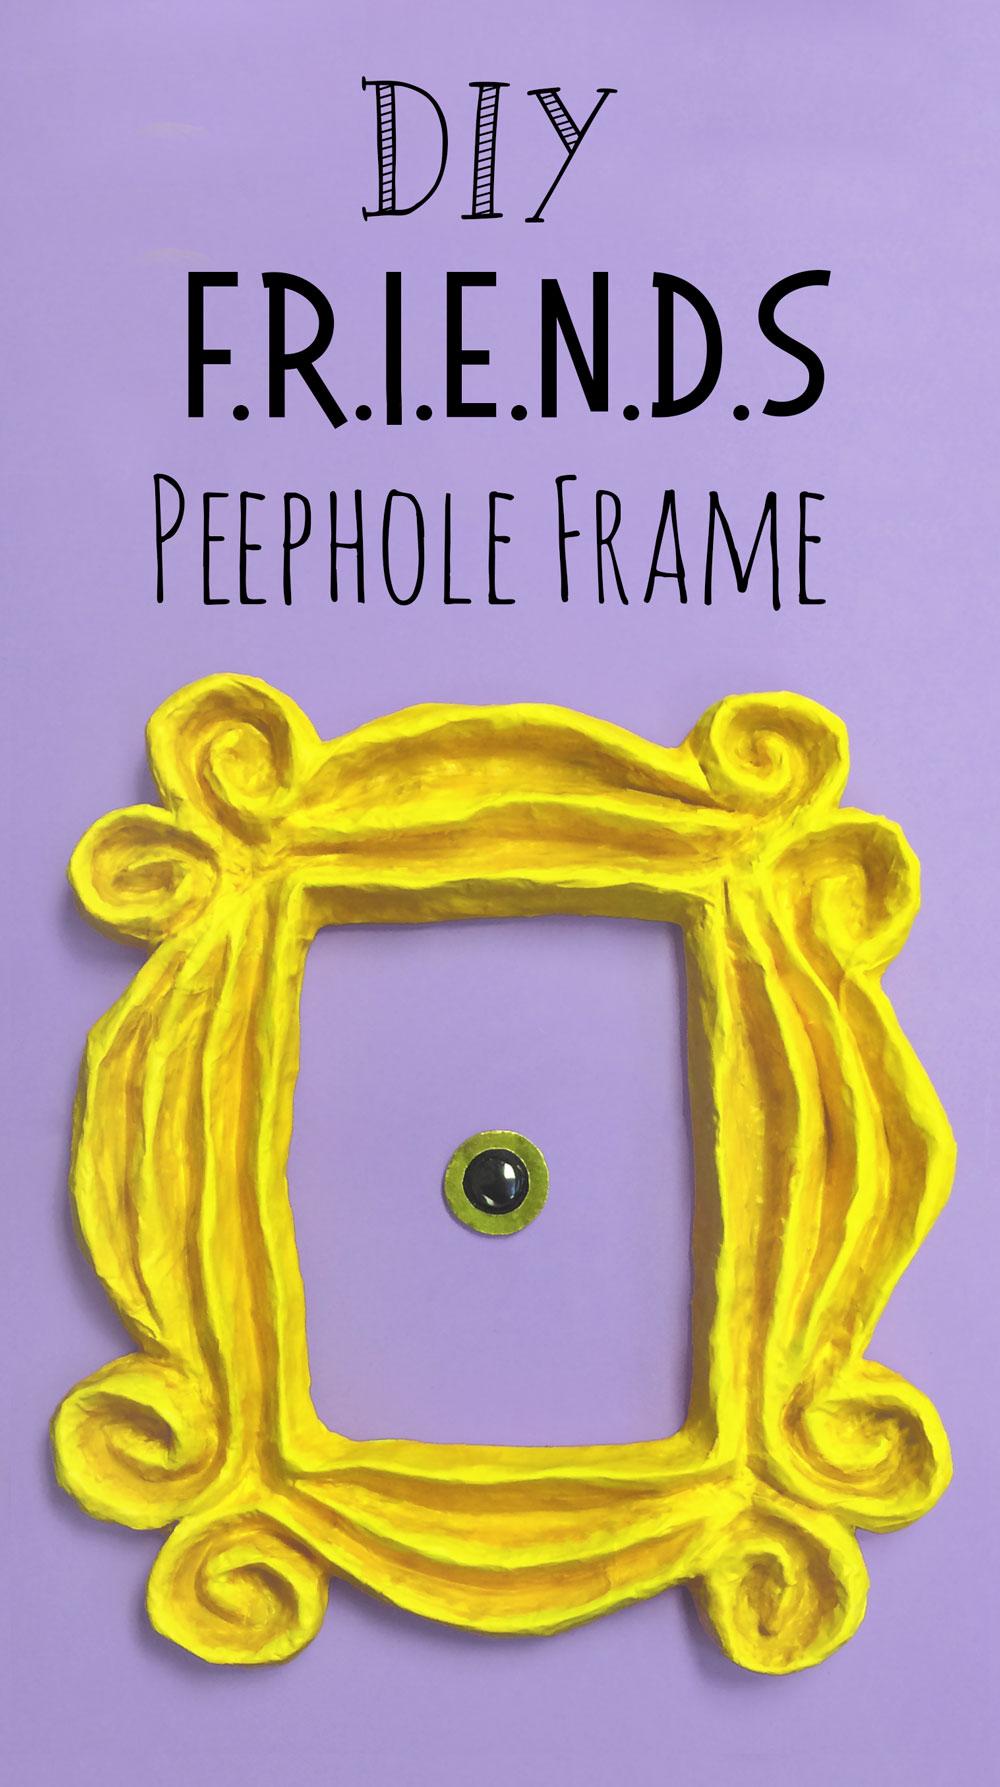 diy Friends peephole frame